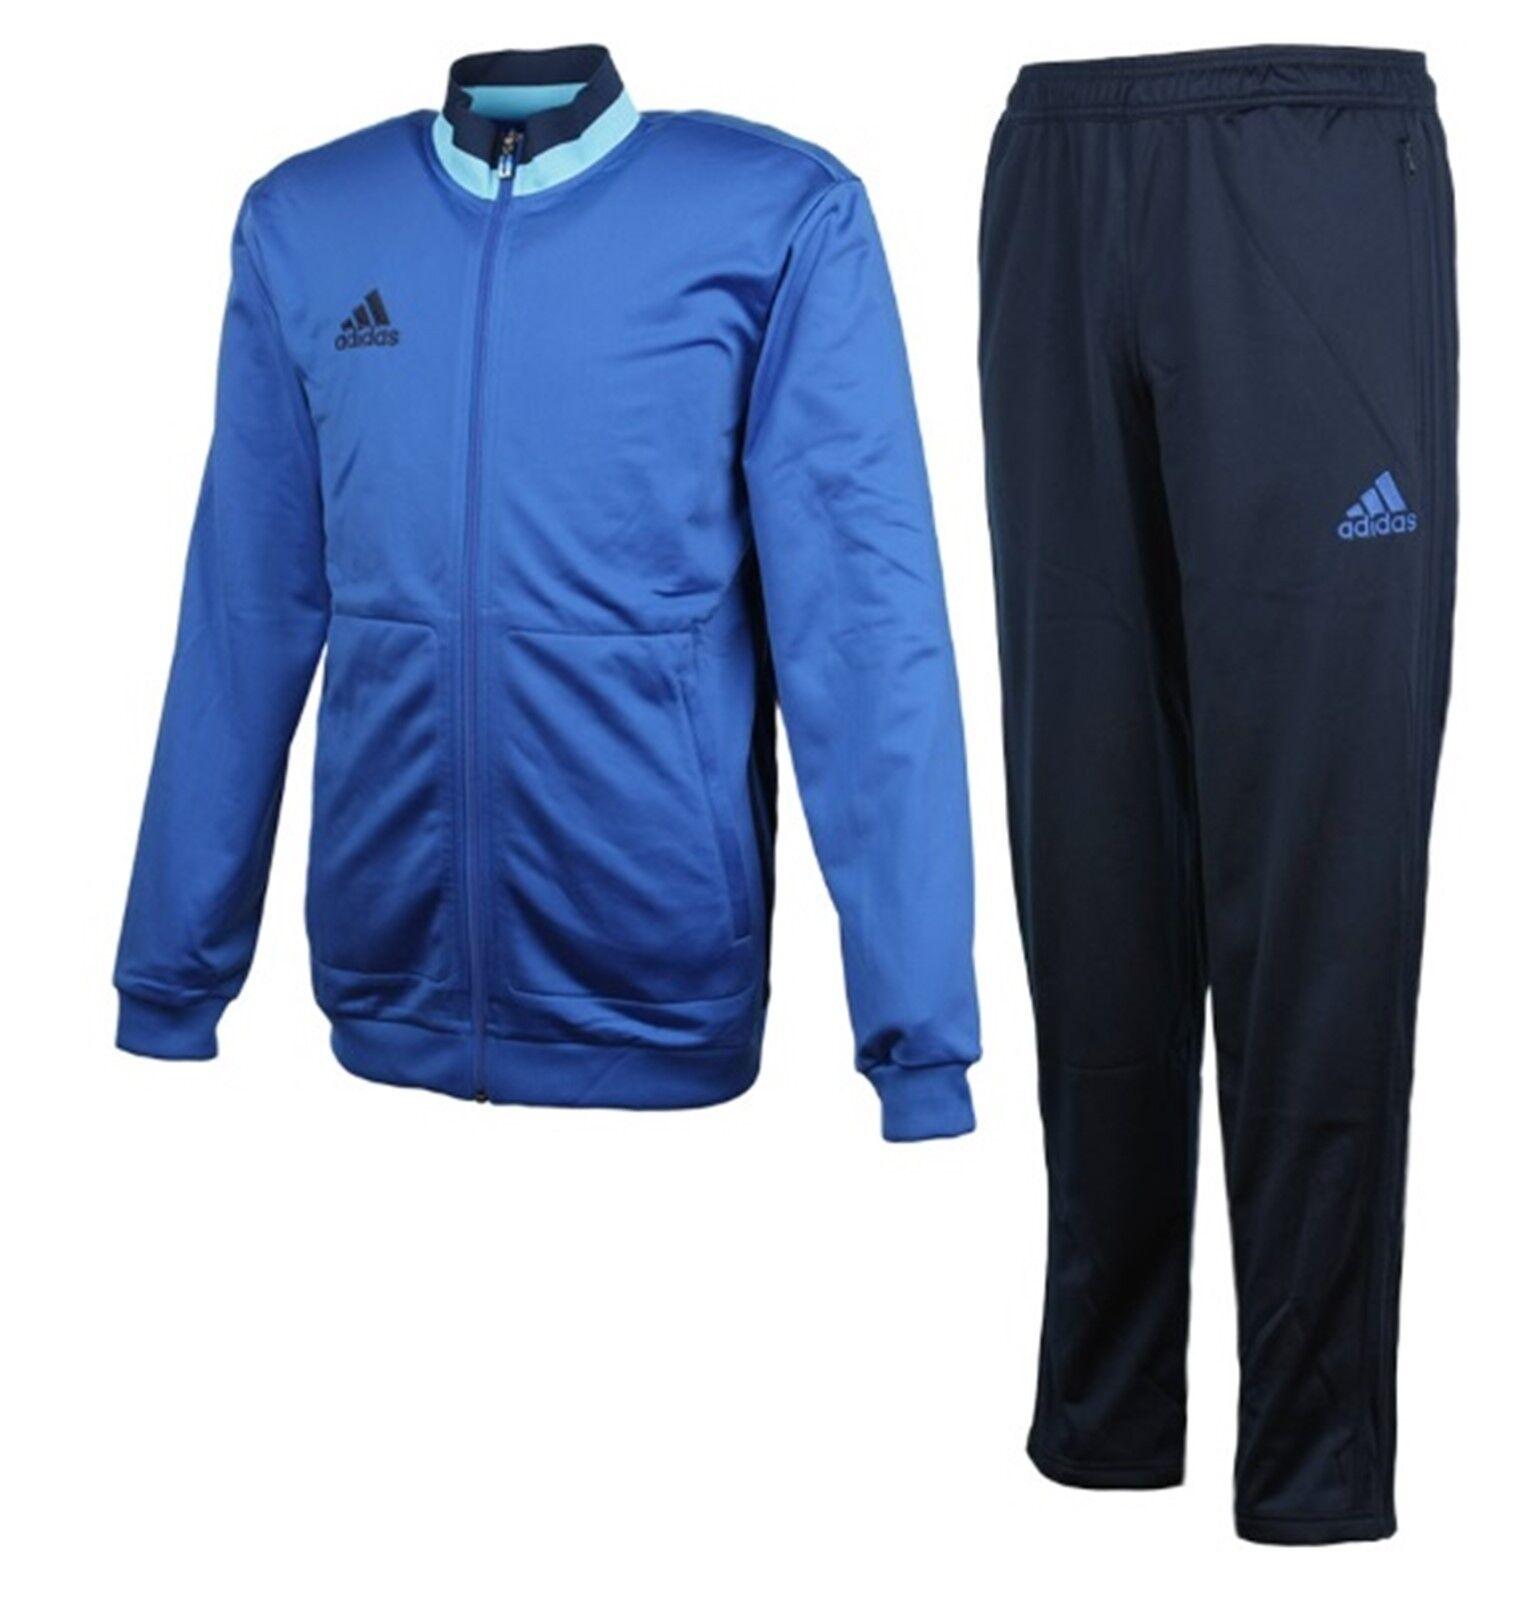 Adidas Men Condivo 16 PES GIMO Suit Set Blau Navy Training Jacket Pant AX6543